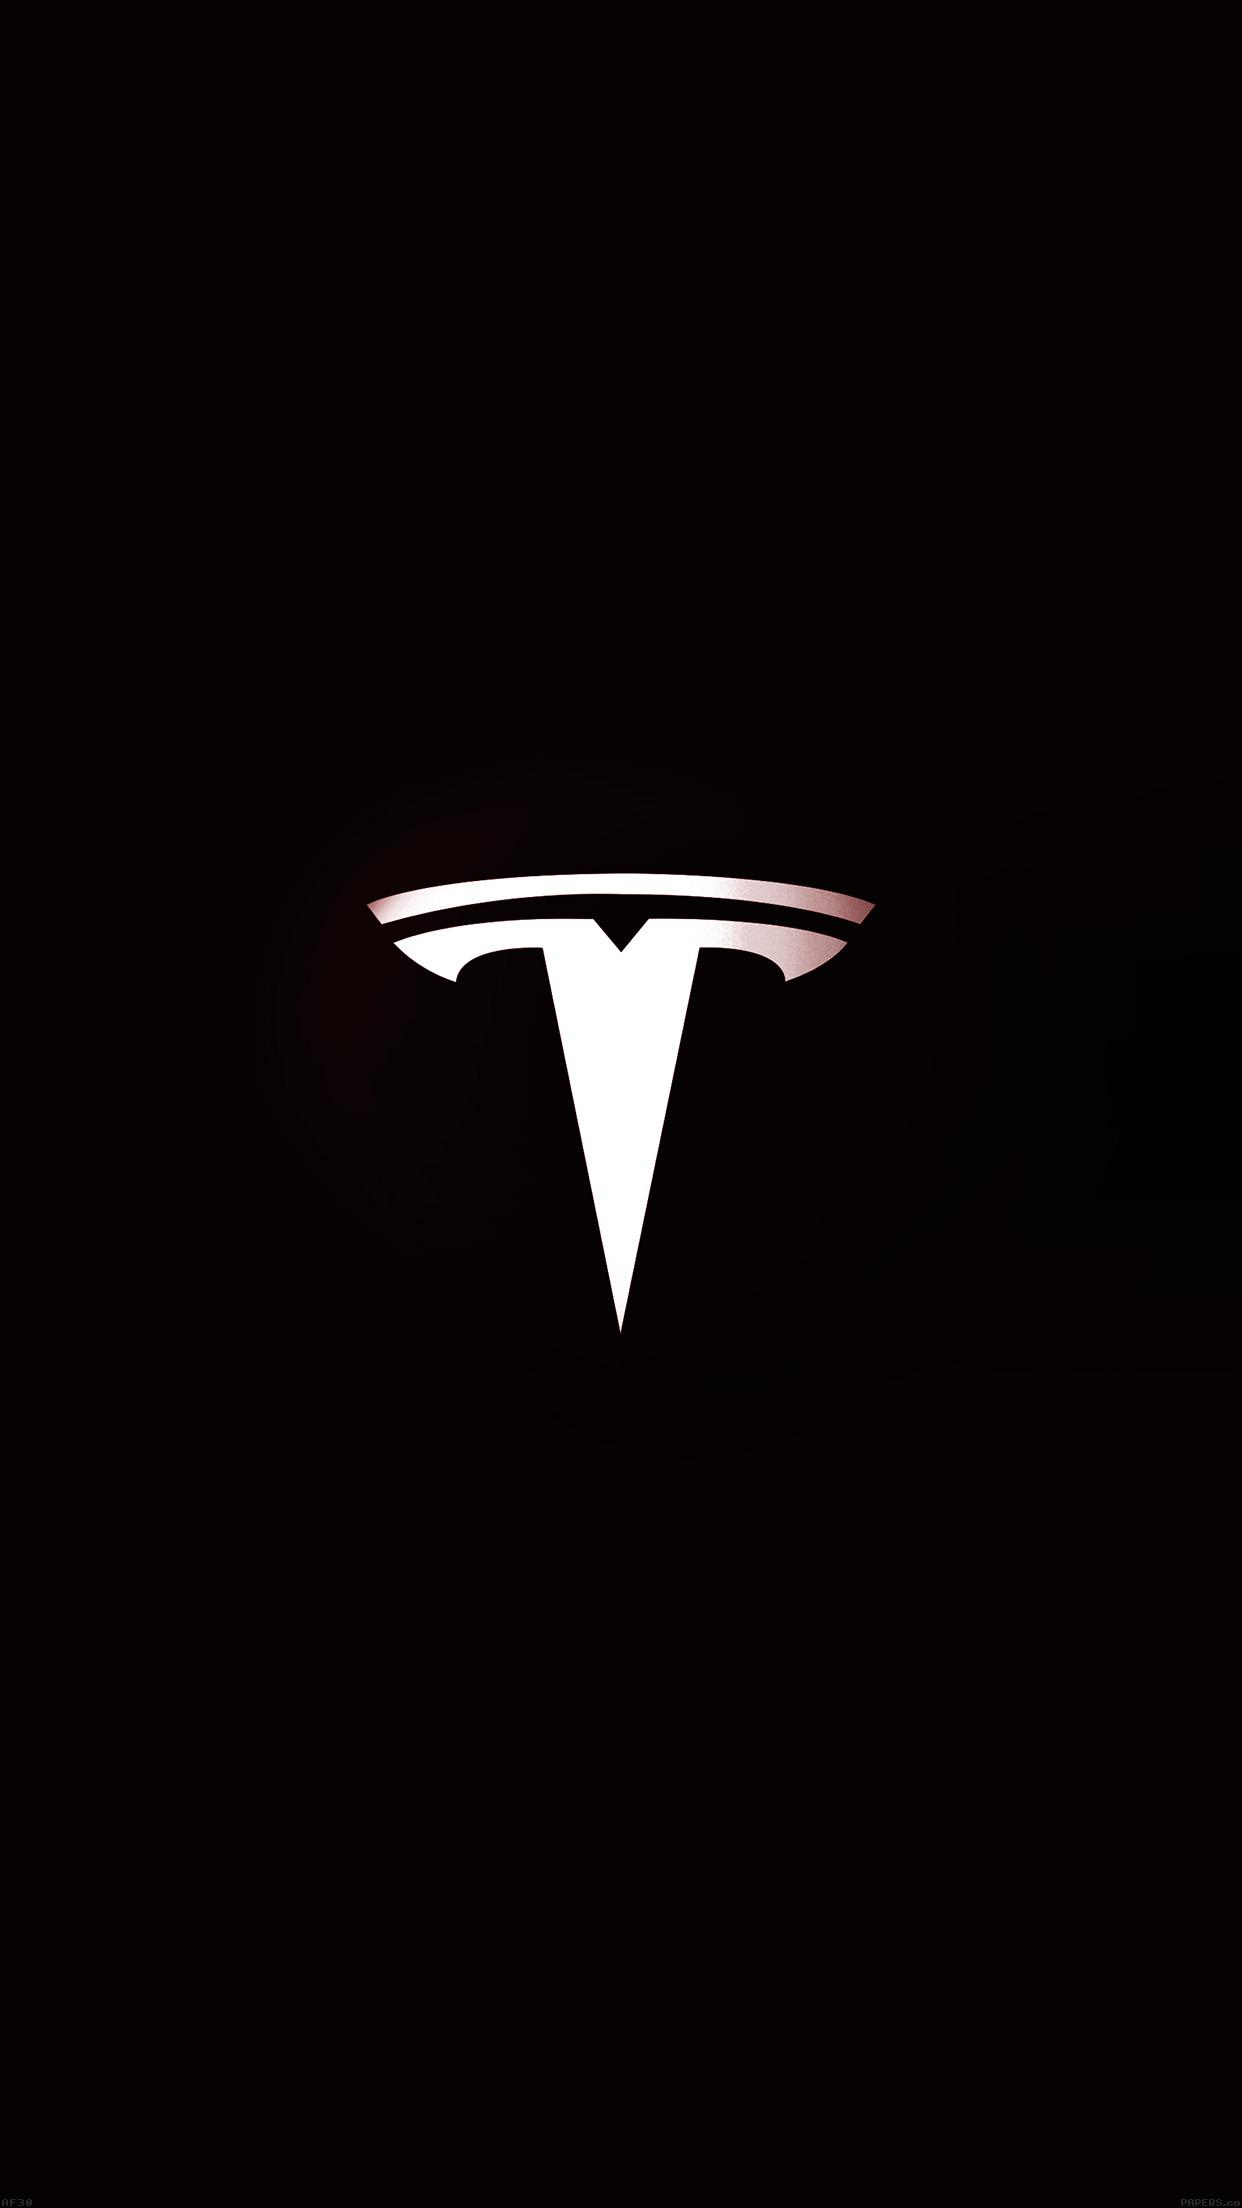 Tesla Iphone Wallpapers Top Free Tesla Iphone Backgrounds Wallpaperaccess